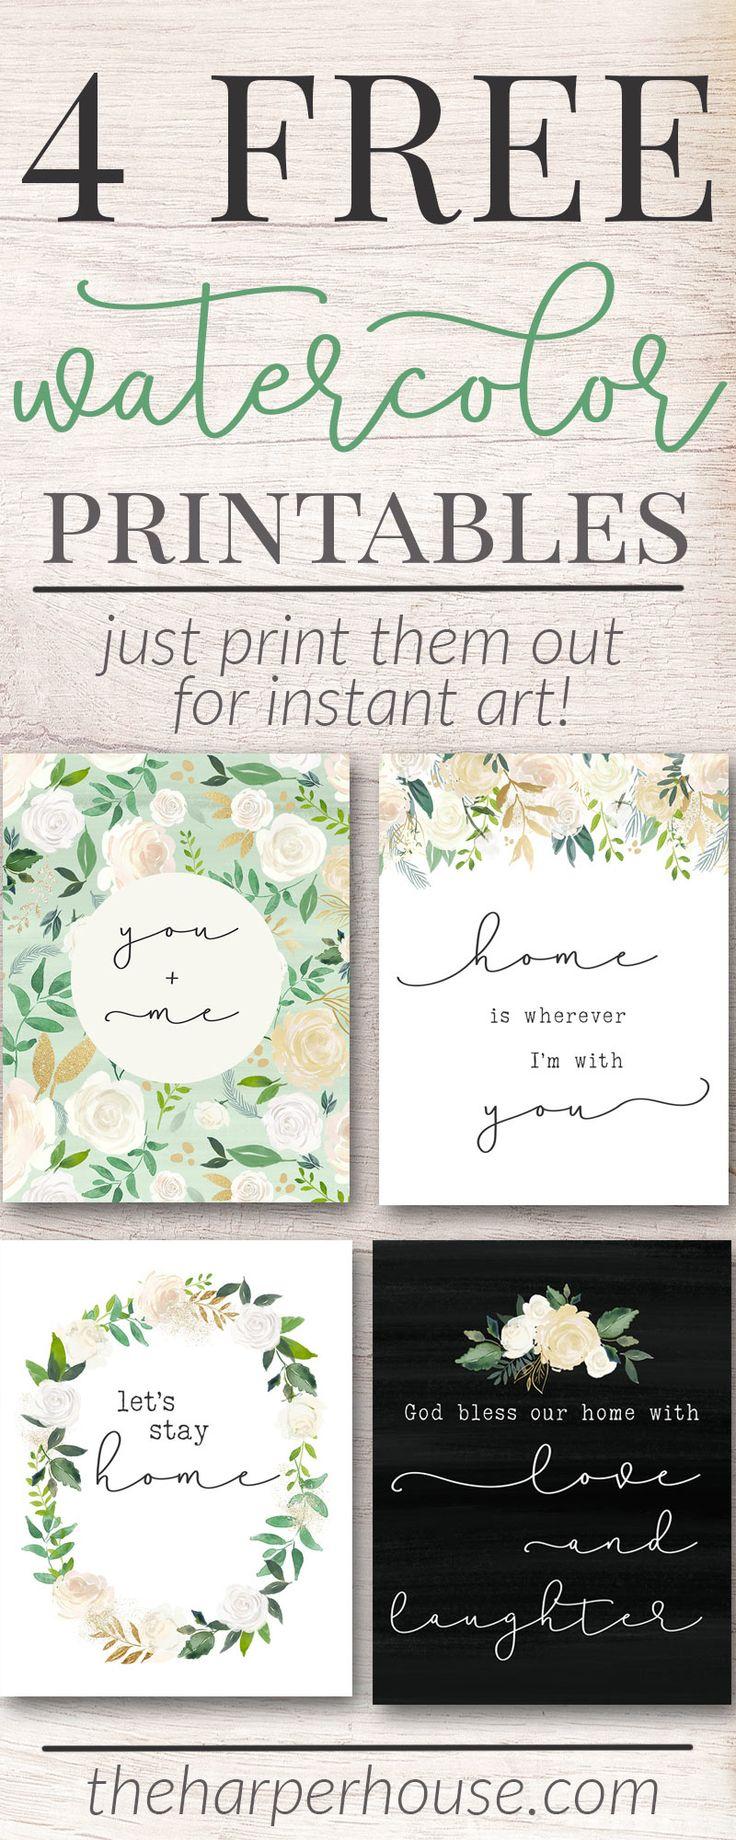 Free Printable Art Prints   watercolor flower prints   instant art   free digital prints   #freeprintable #homedecor #gallerywall #art #farmhousestyle